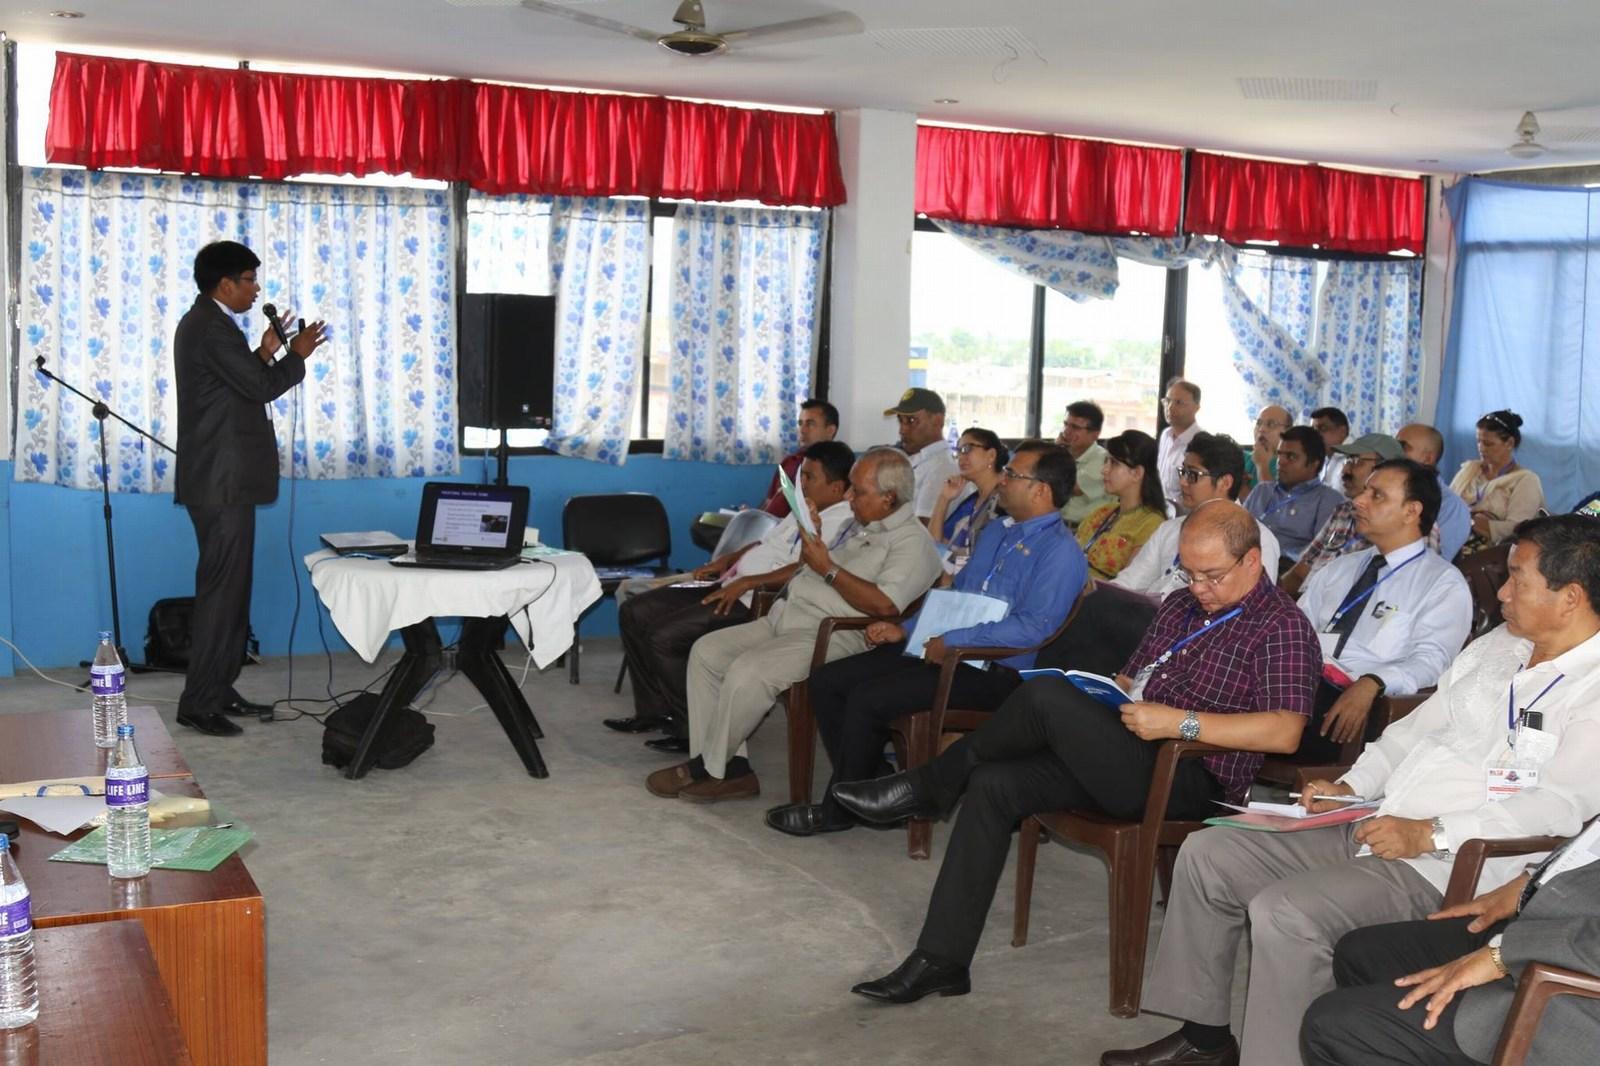 Regional-Rotary-Foundation-Seminar-Intercity-Meeting-Rotary-Club-of-Kakarvitta-25